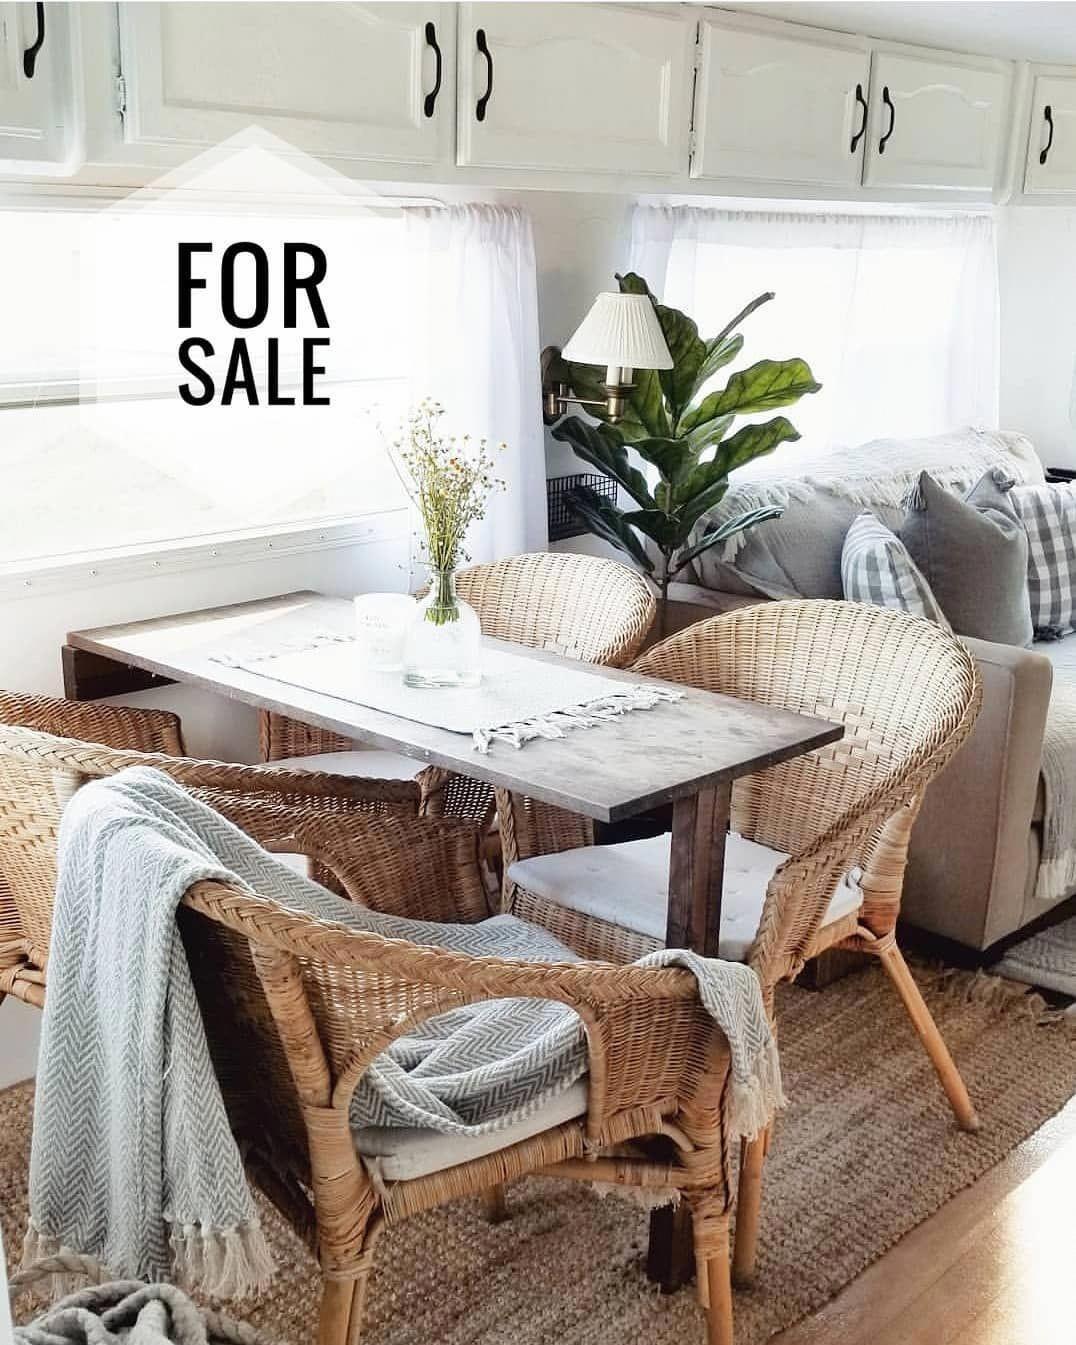 Interior Shutters For Sale #InteriorTrailerLights